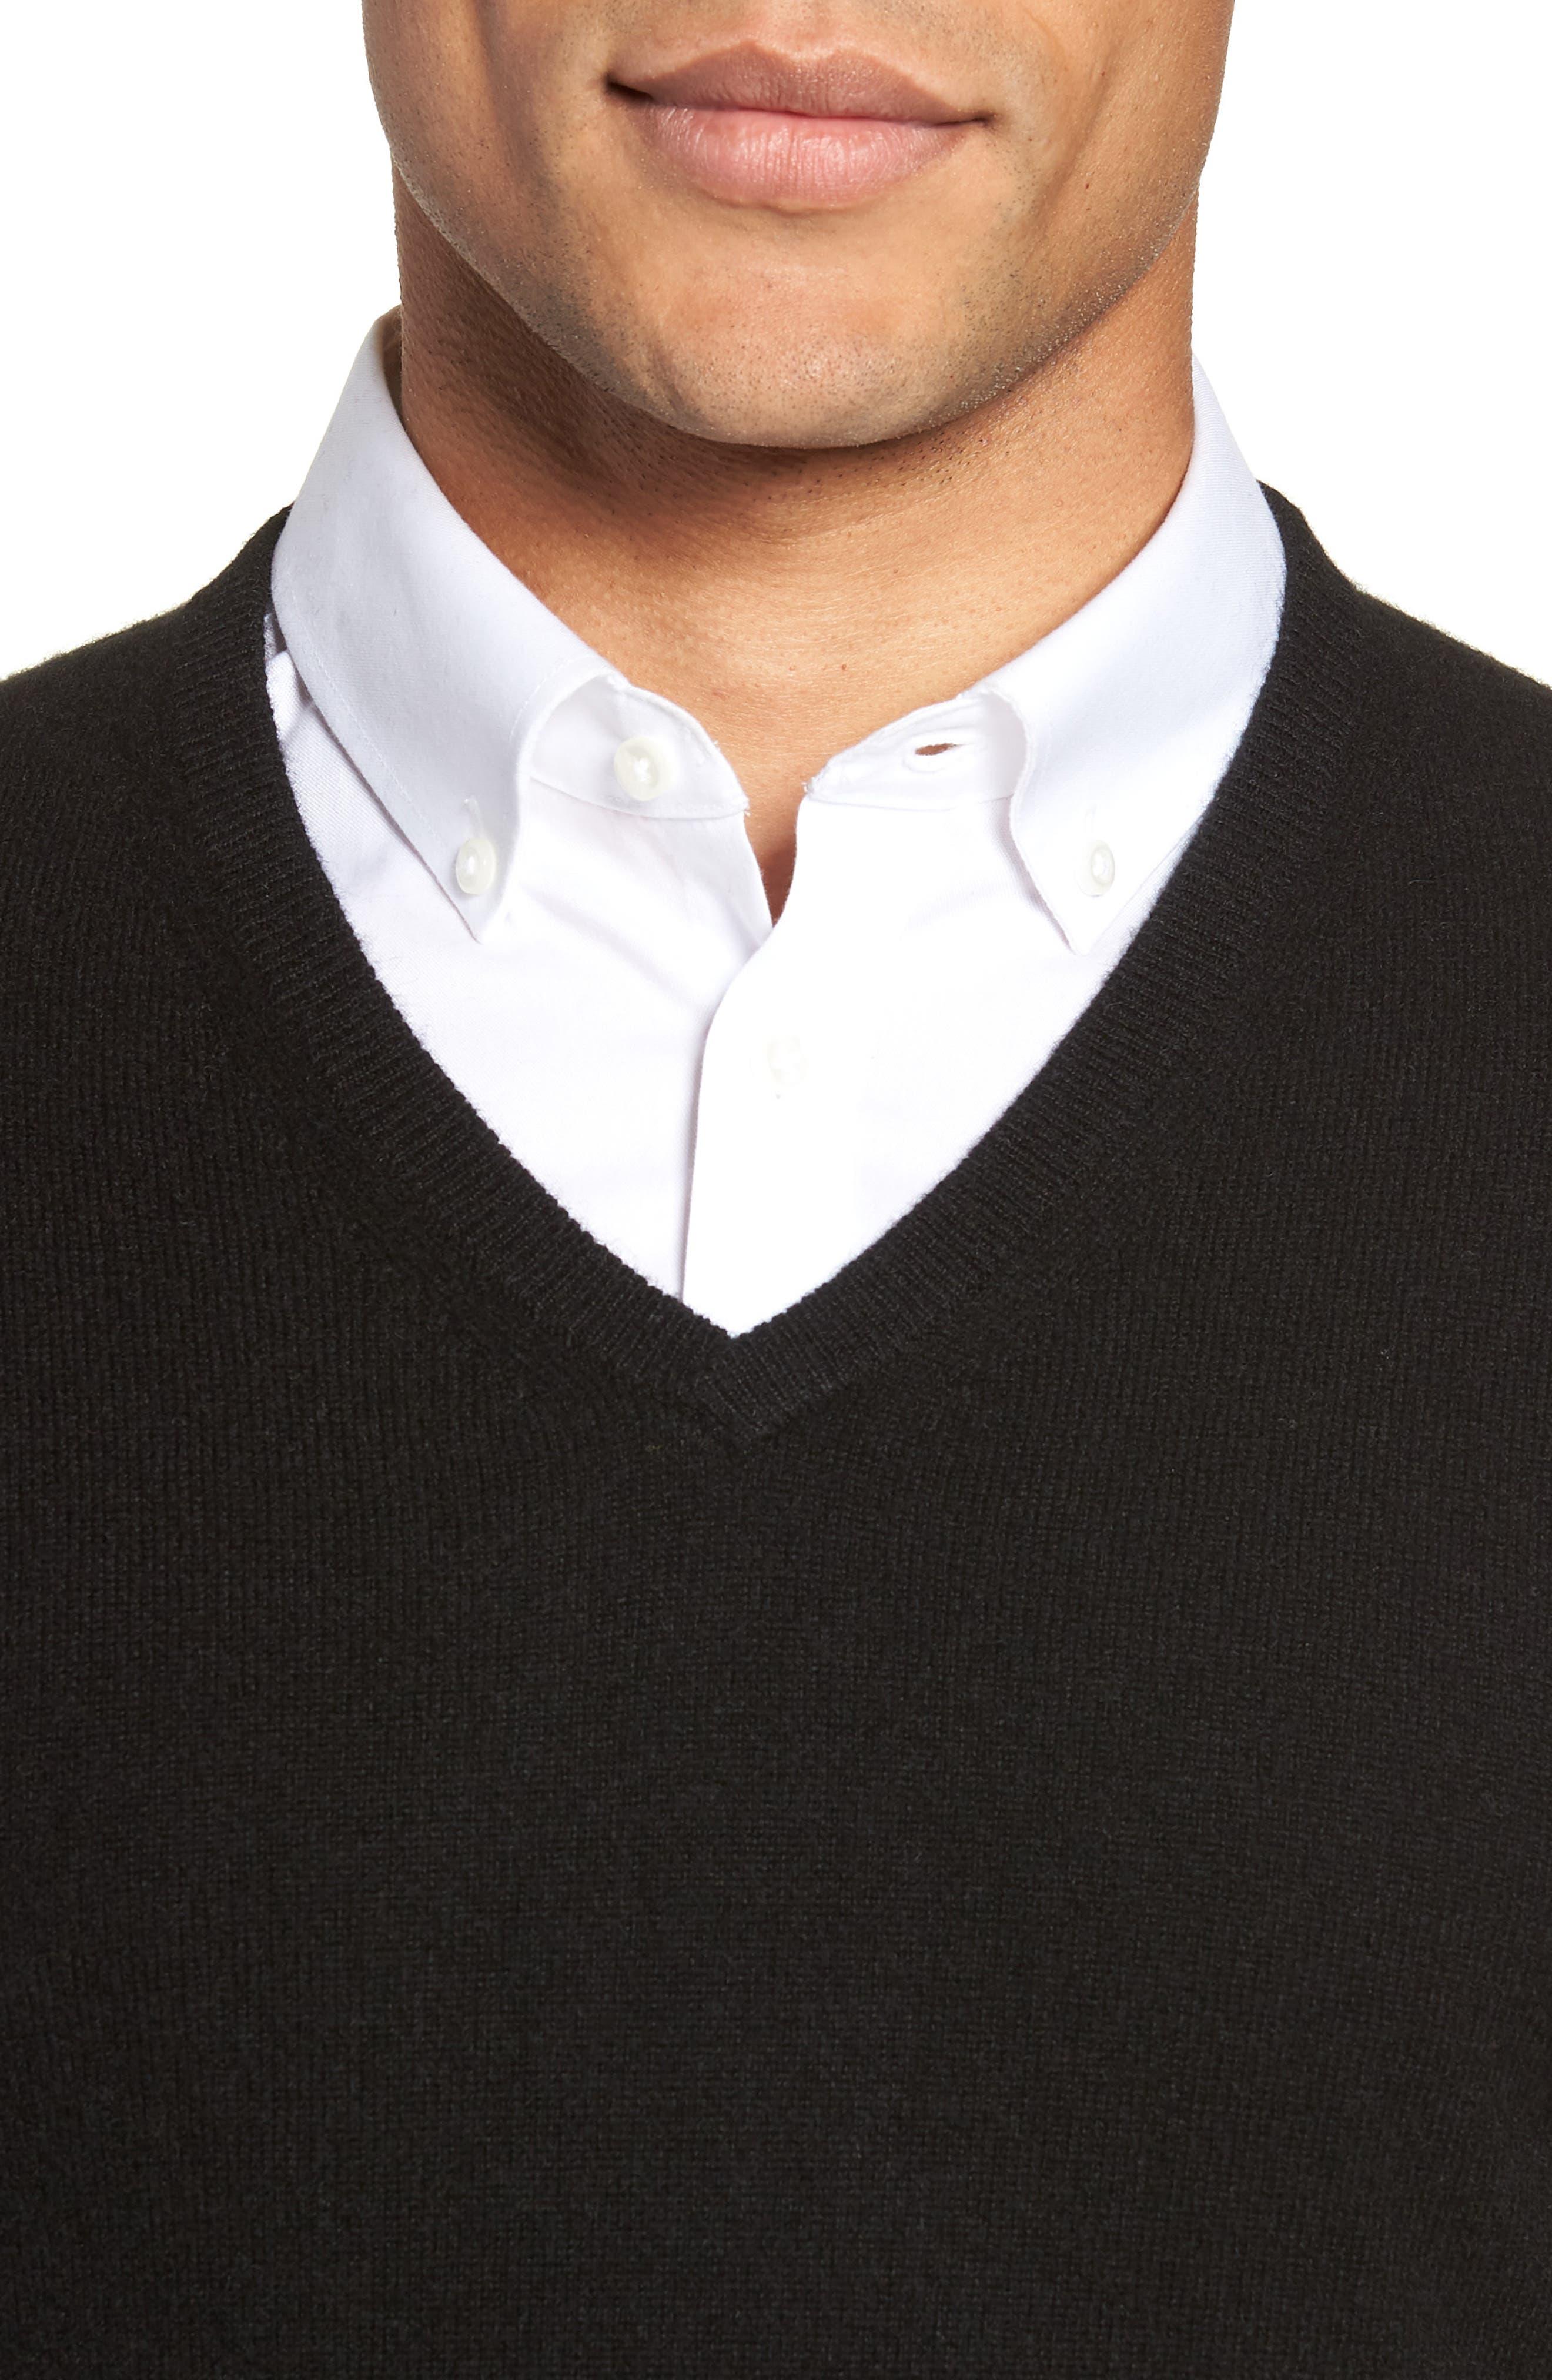 V-Neck Cashmere Sweater,                             Alternate thumbnail 4, color,                             BLACK JET